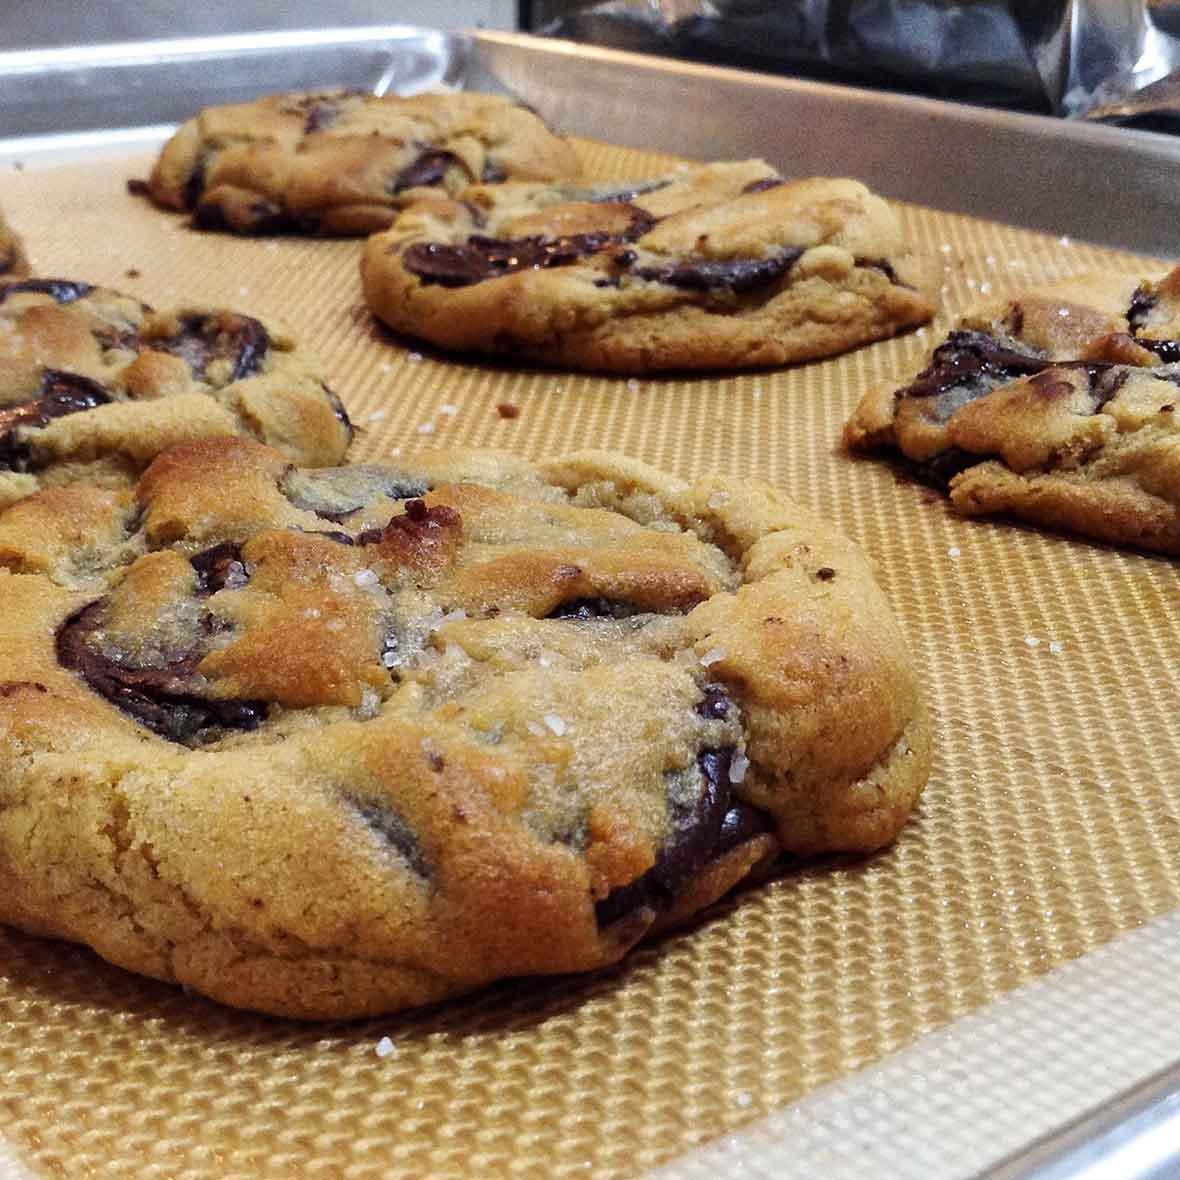 David Leite's Chocolate Chip Cookies Recipe